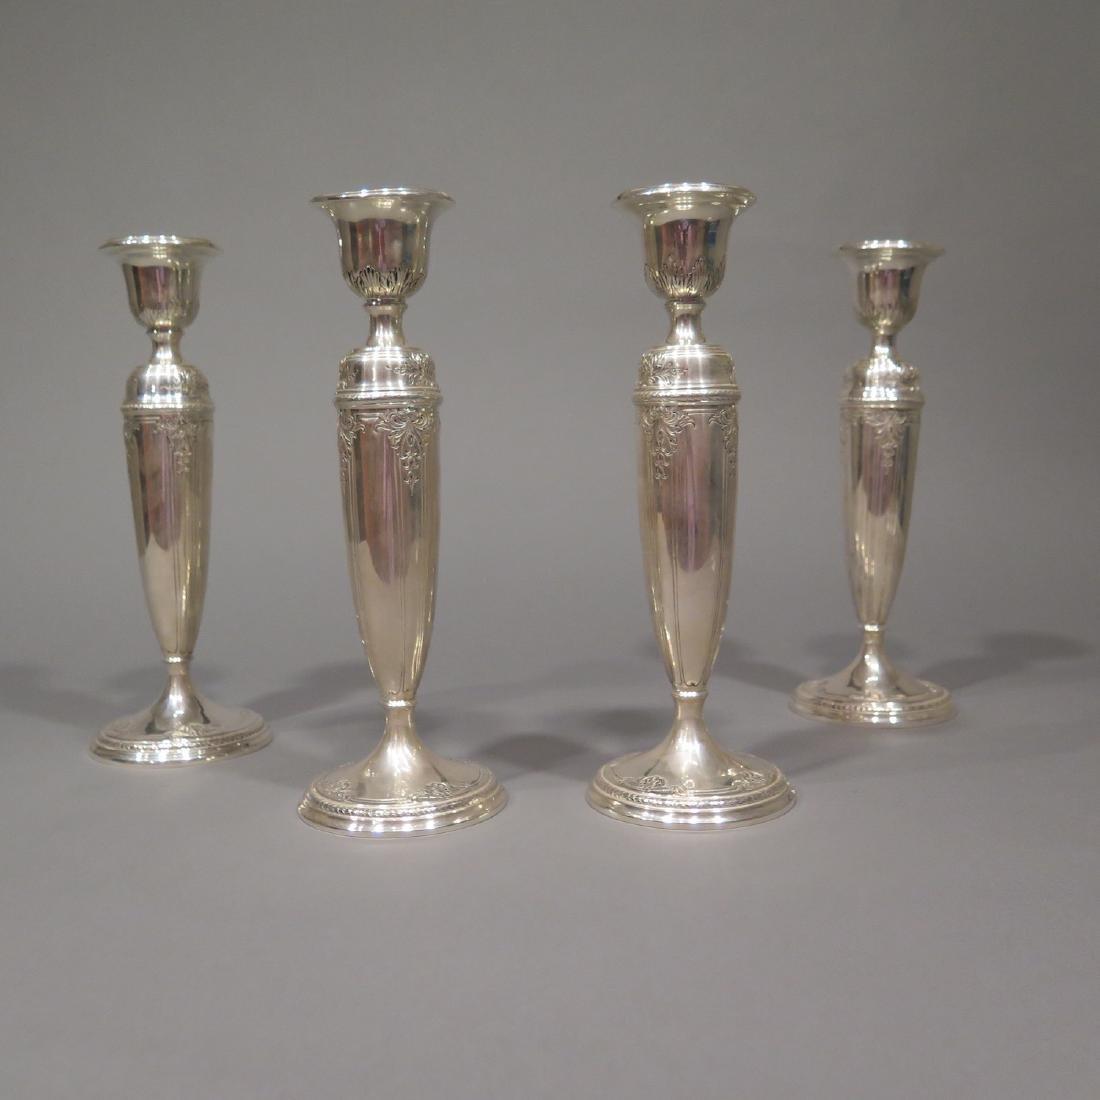 4 Sterling Silver Candlesticks